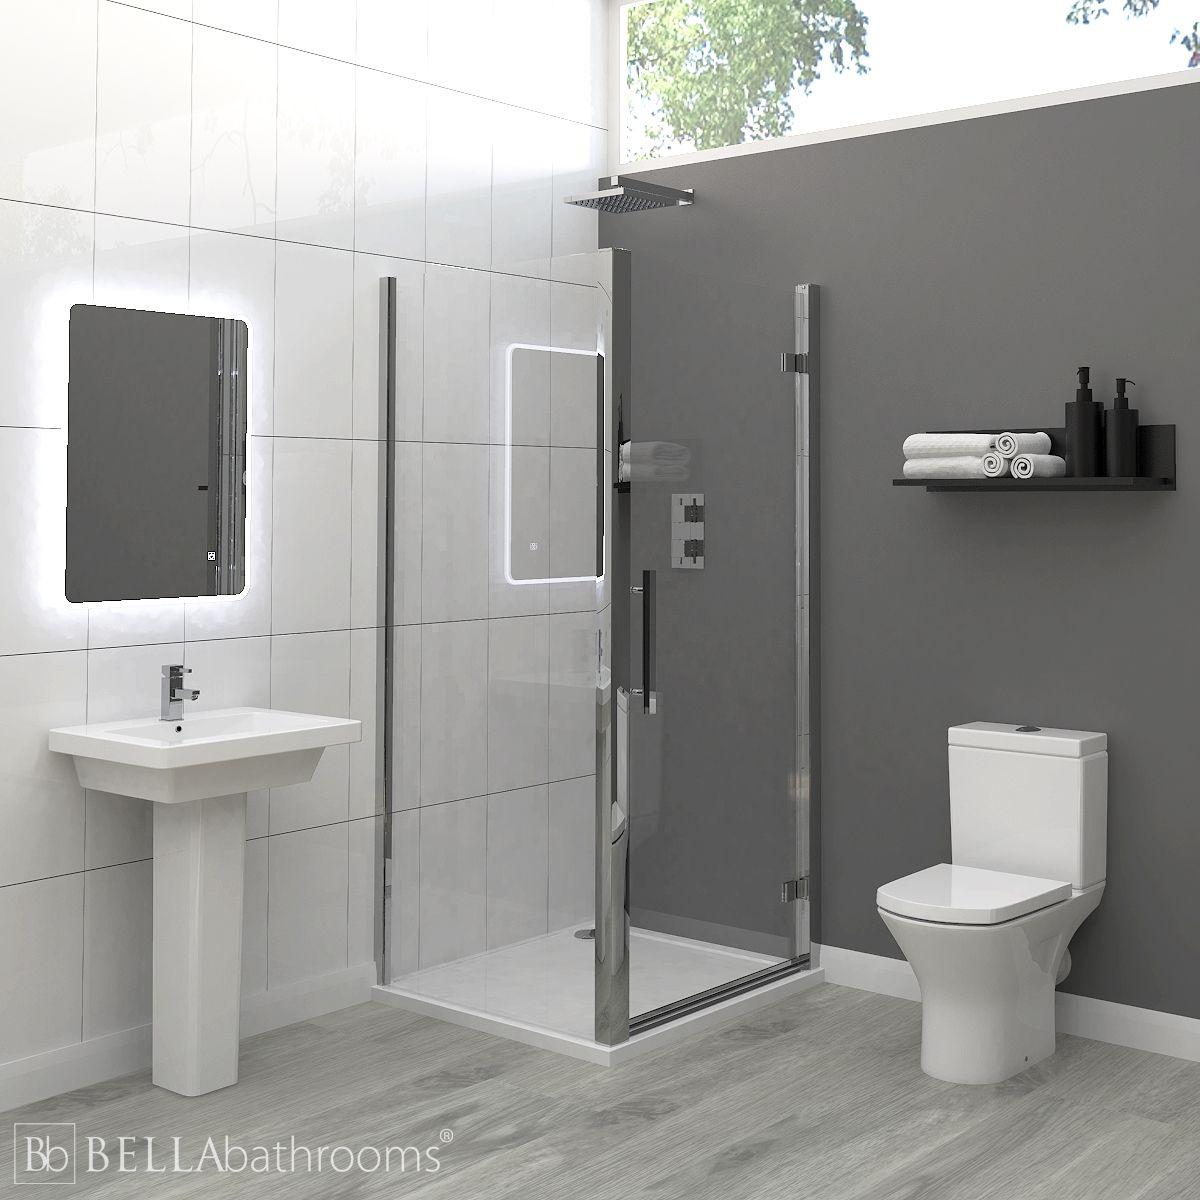 RAK Resort Ensuite Bathroom with Apex Hinged Shower Enclosure